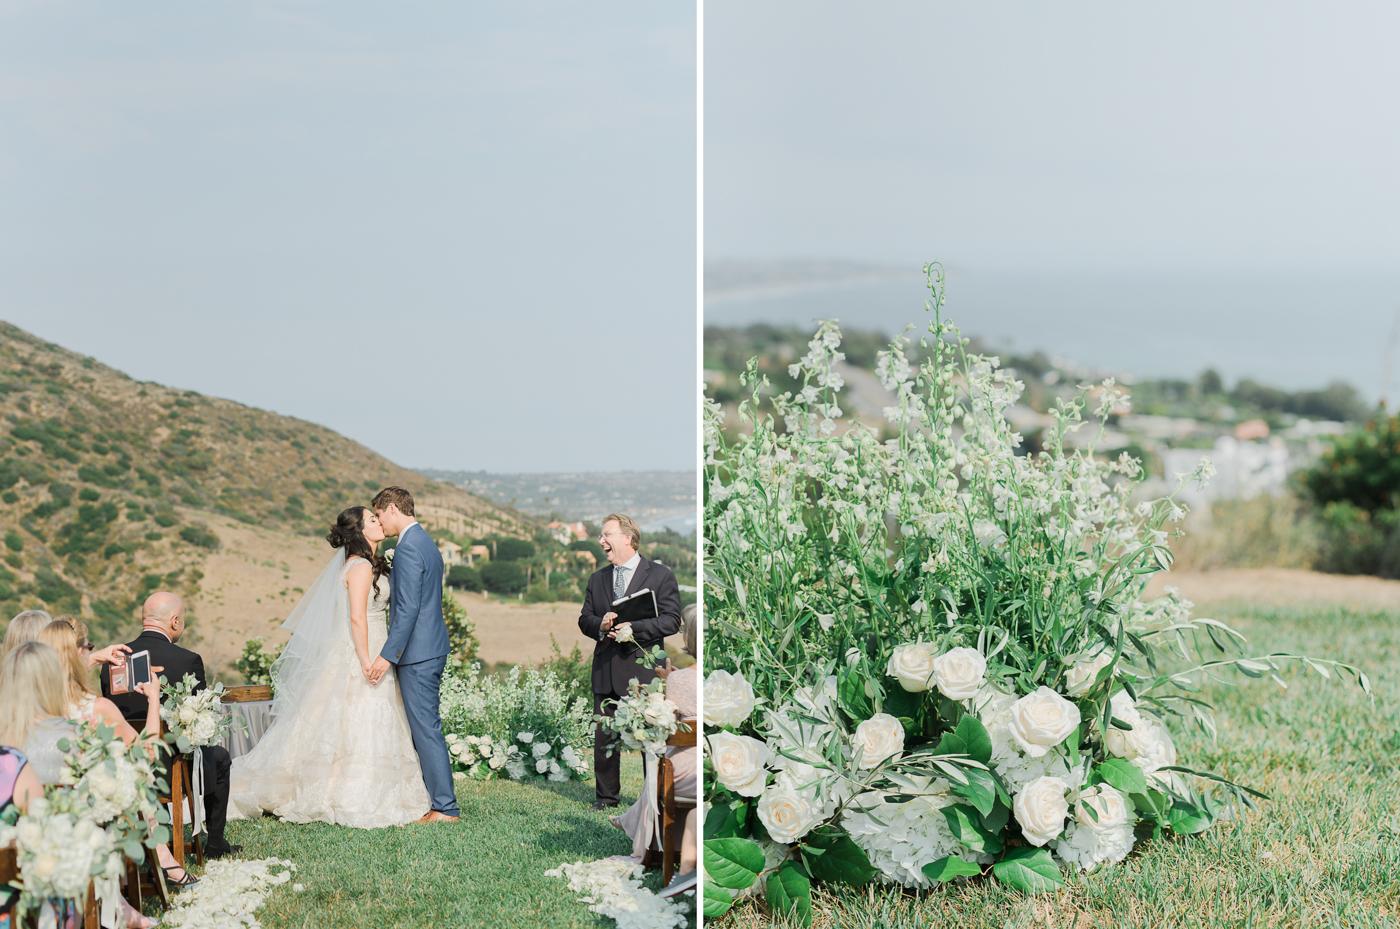 AKP_S&F_Malibu_Wedding_Fine_Art_Photography_Los_Angeles-21_ceremony.jpg